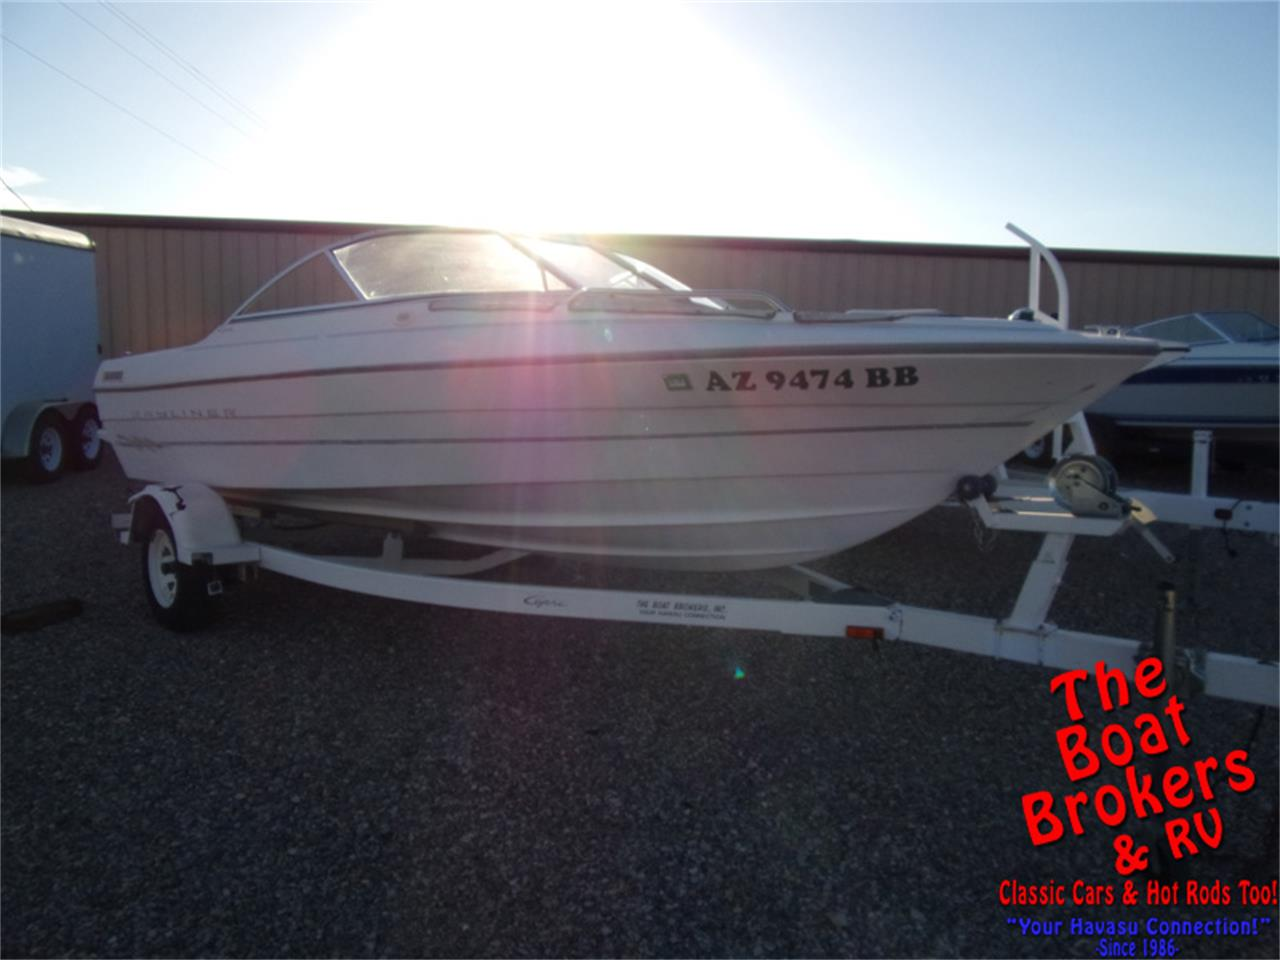 For Sale: 1999 bayliner Capri in Lake Havasu, Arizona